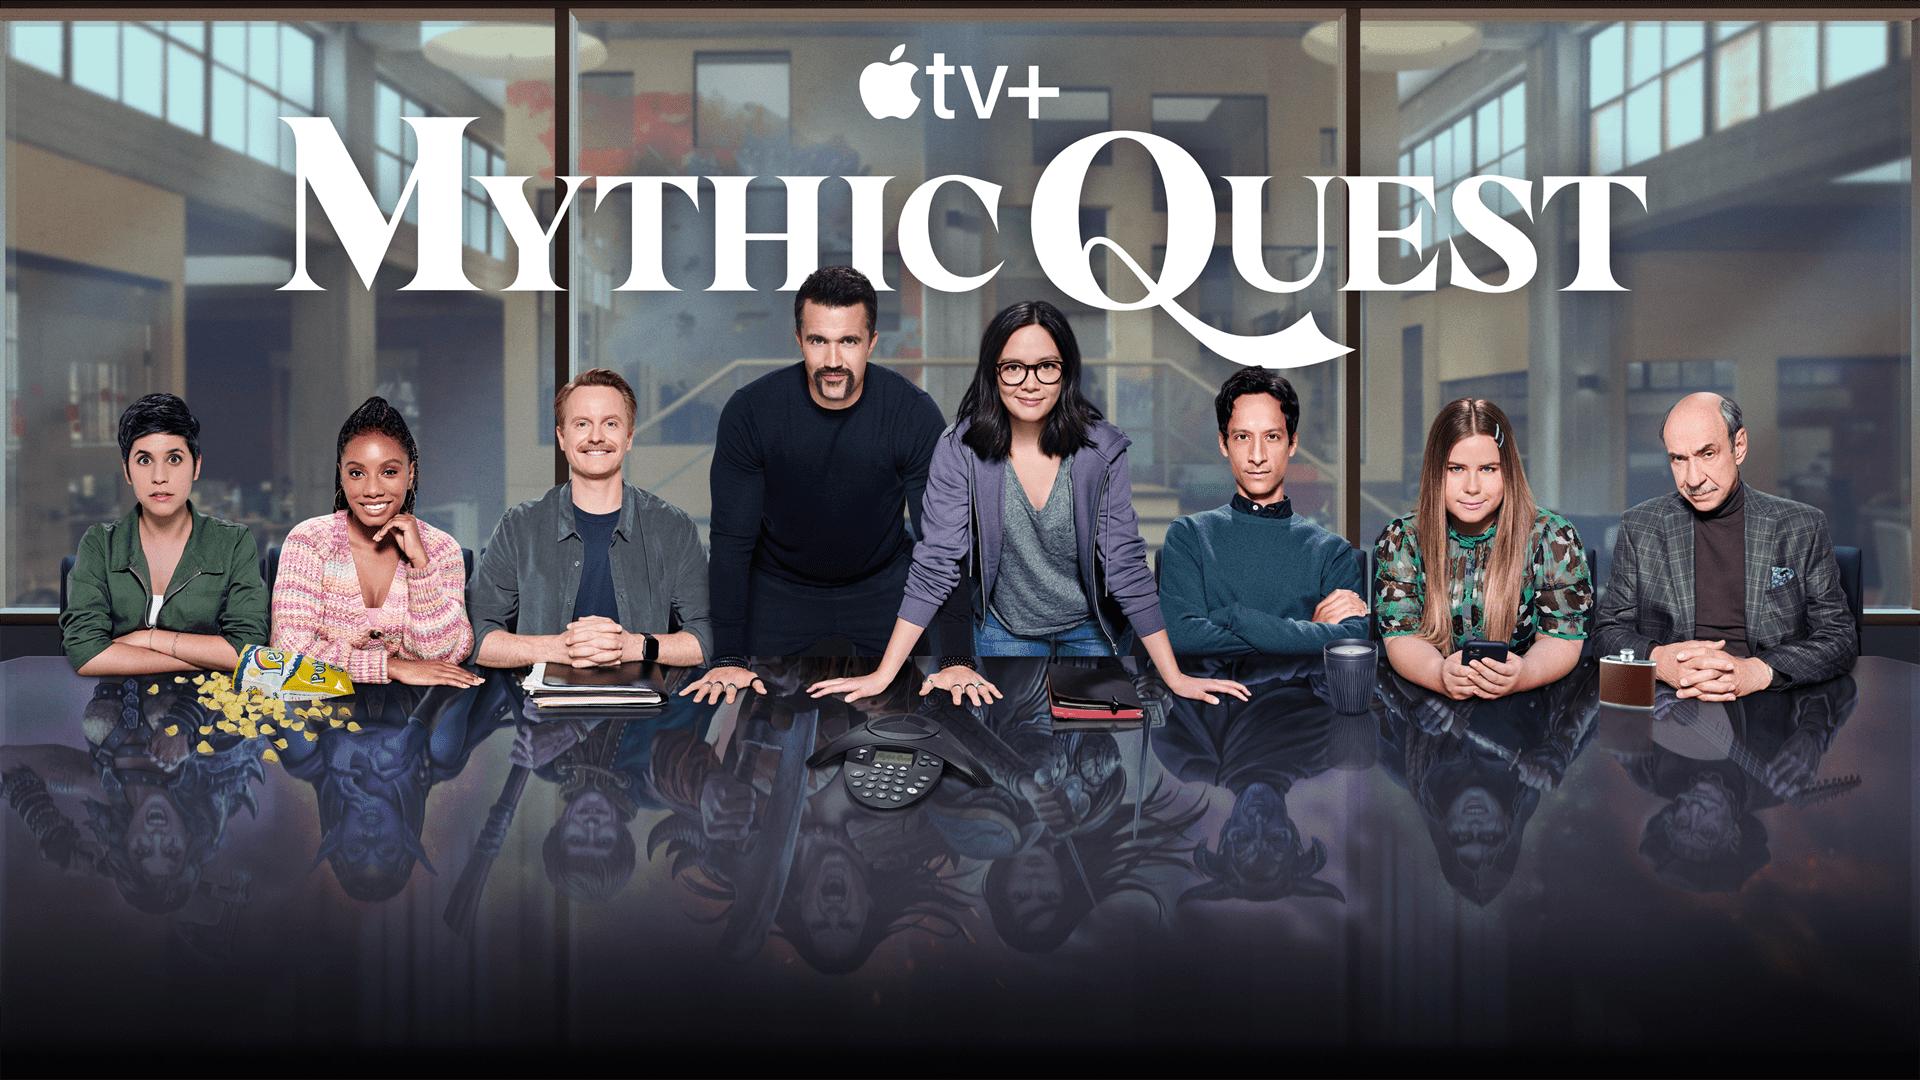 "Apple TV+ ประกาศสร้าง ""Mythic Quest ต่อ 2 ซีซันรวด - เตรียมพบซีรีส์ตลกแนวเบื้องหลังการทำงาน ได้ในซีซัน 3 และ 4"